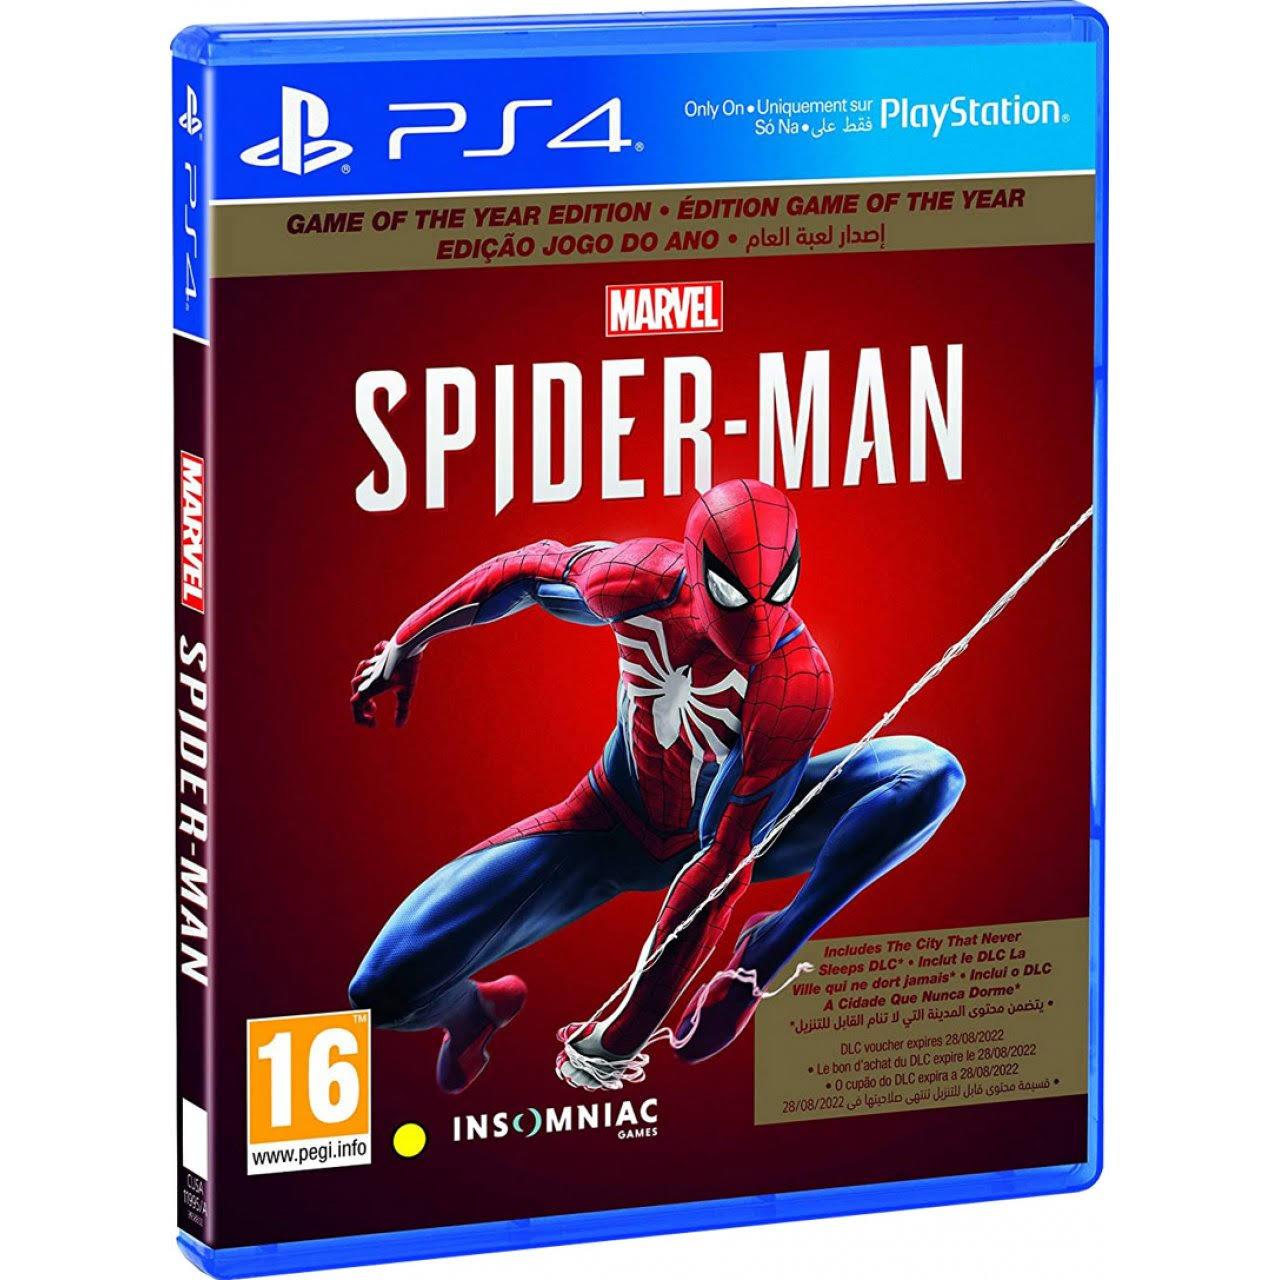 Marvels Spiderman GOTY Edition PS4 £20 (UK Mainland) @ AO